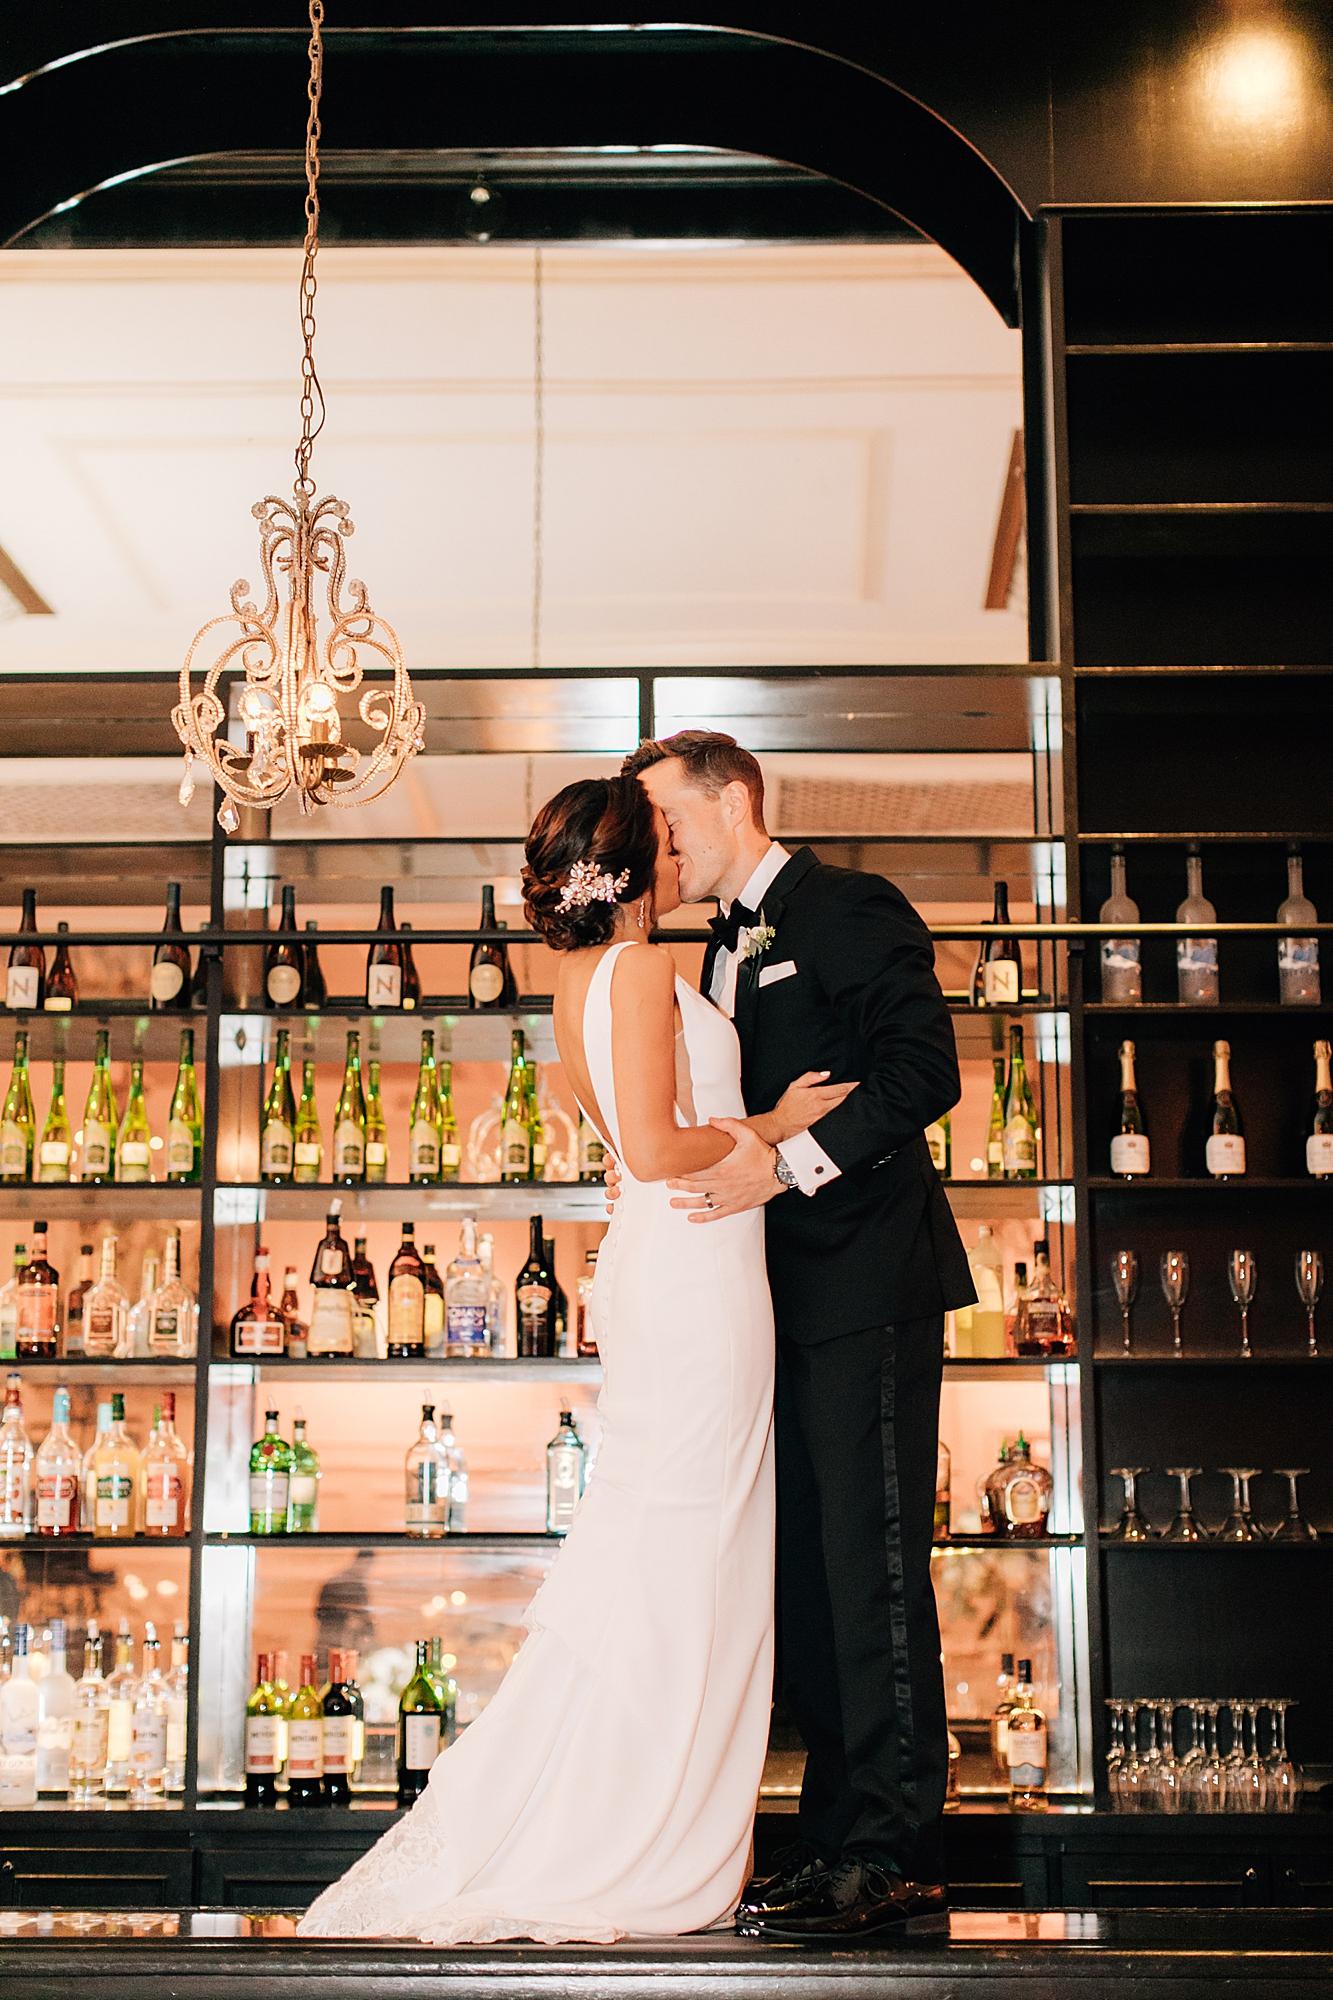 Cescaphe Philadelphia Film Wedding Photography by Magdalena Studios 44